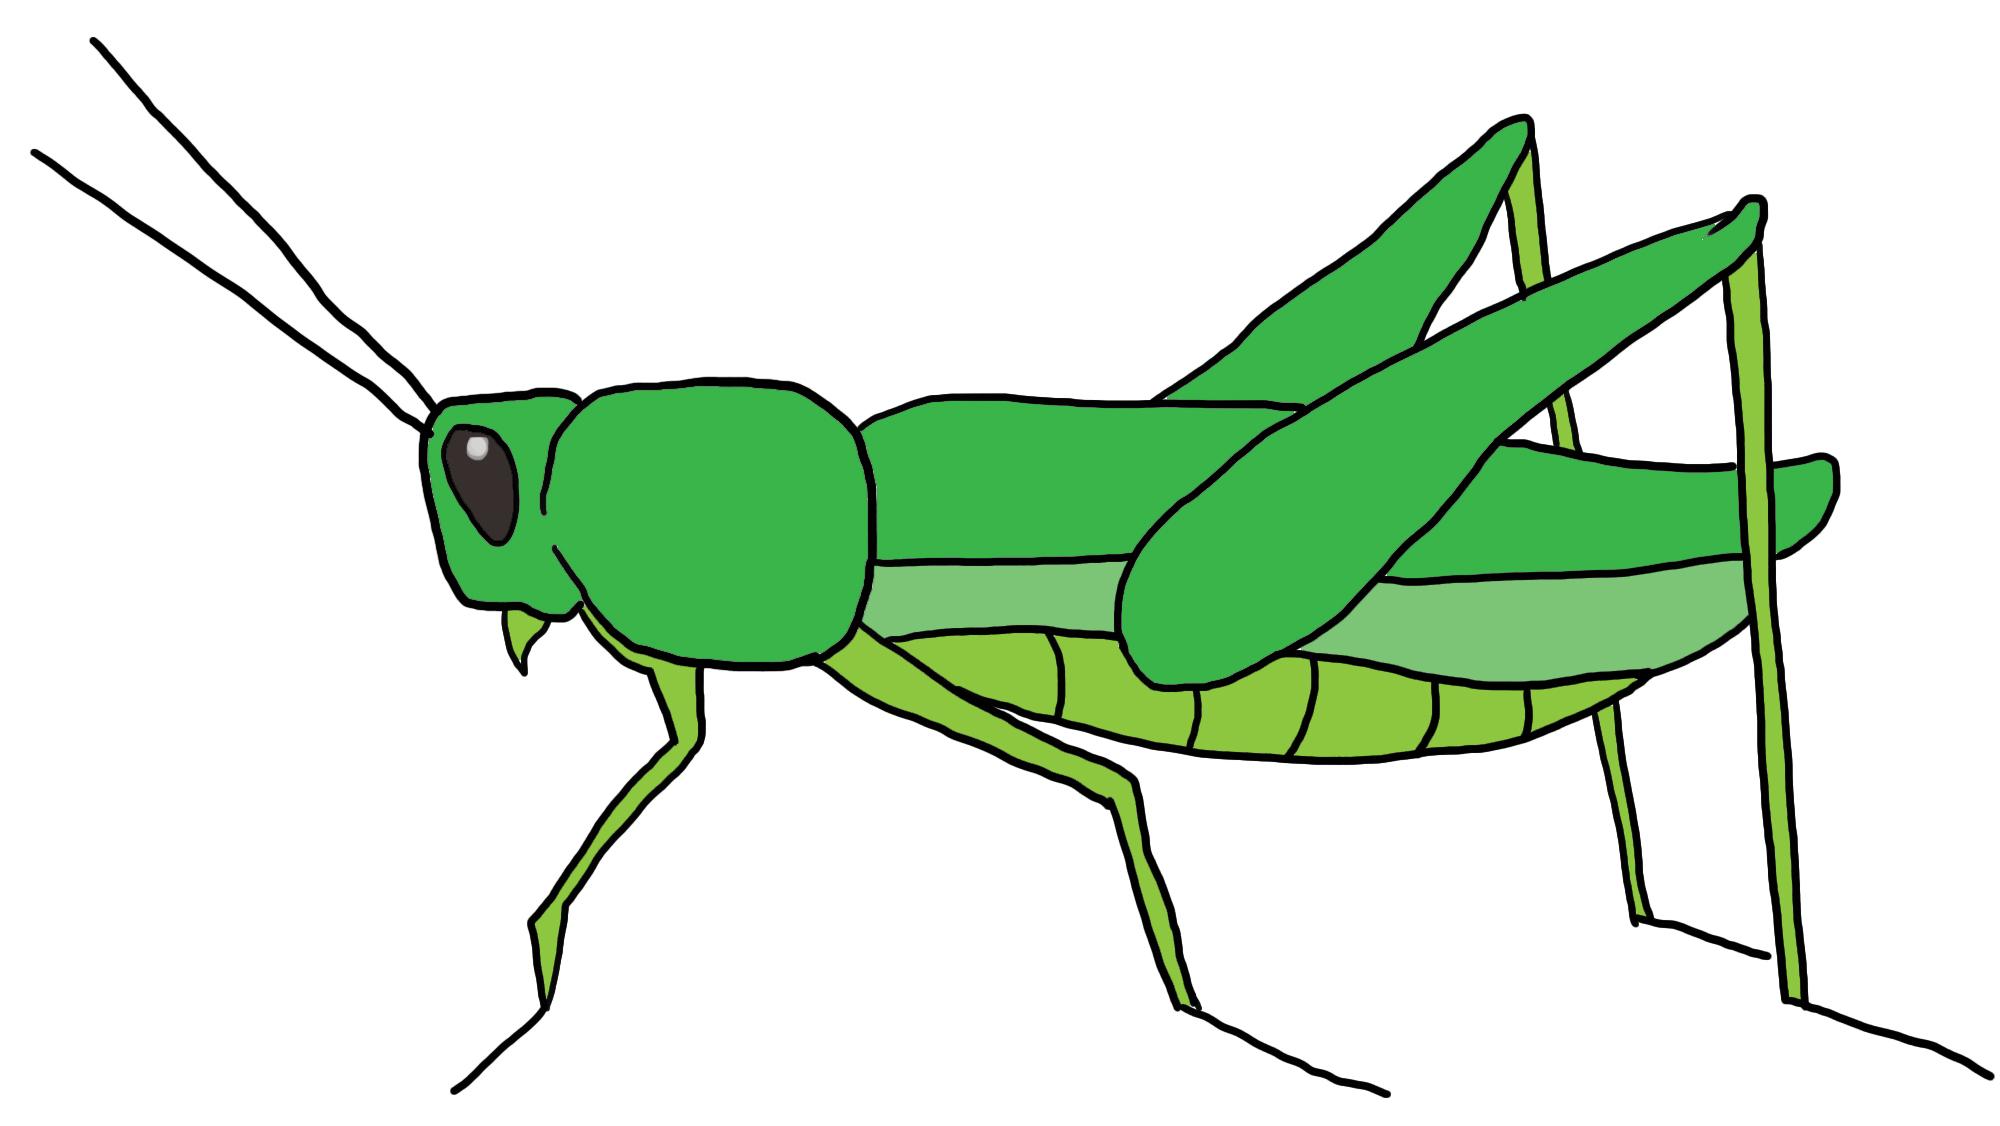 Grasshopper Clip Art-Grasshopper Clip Art-7